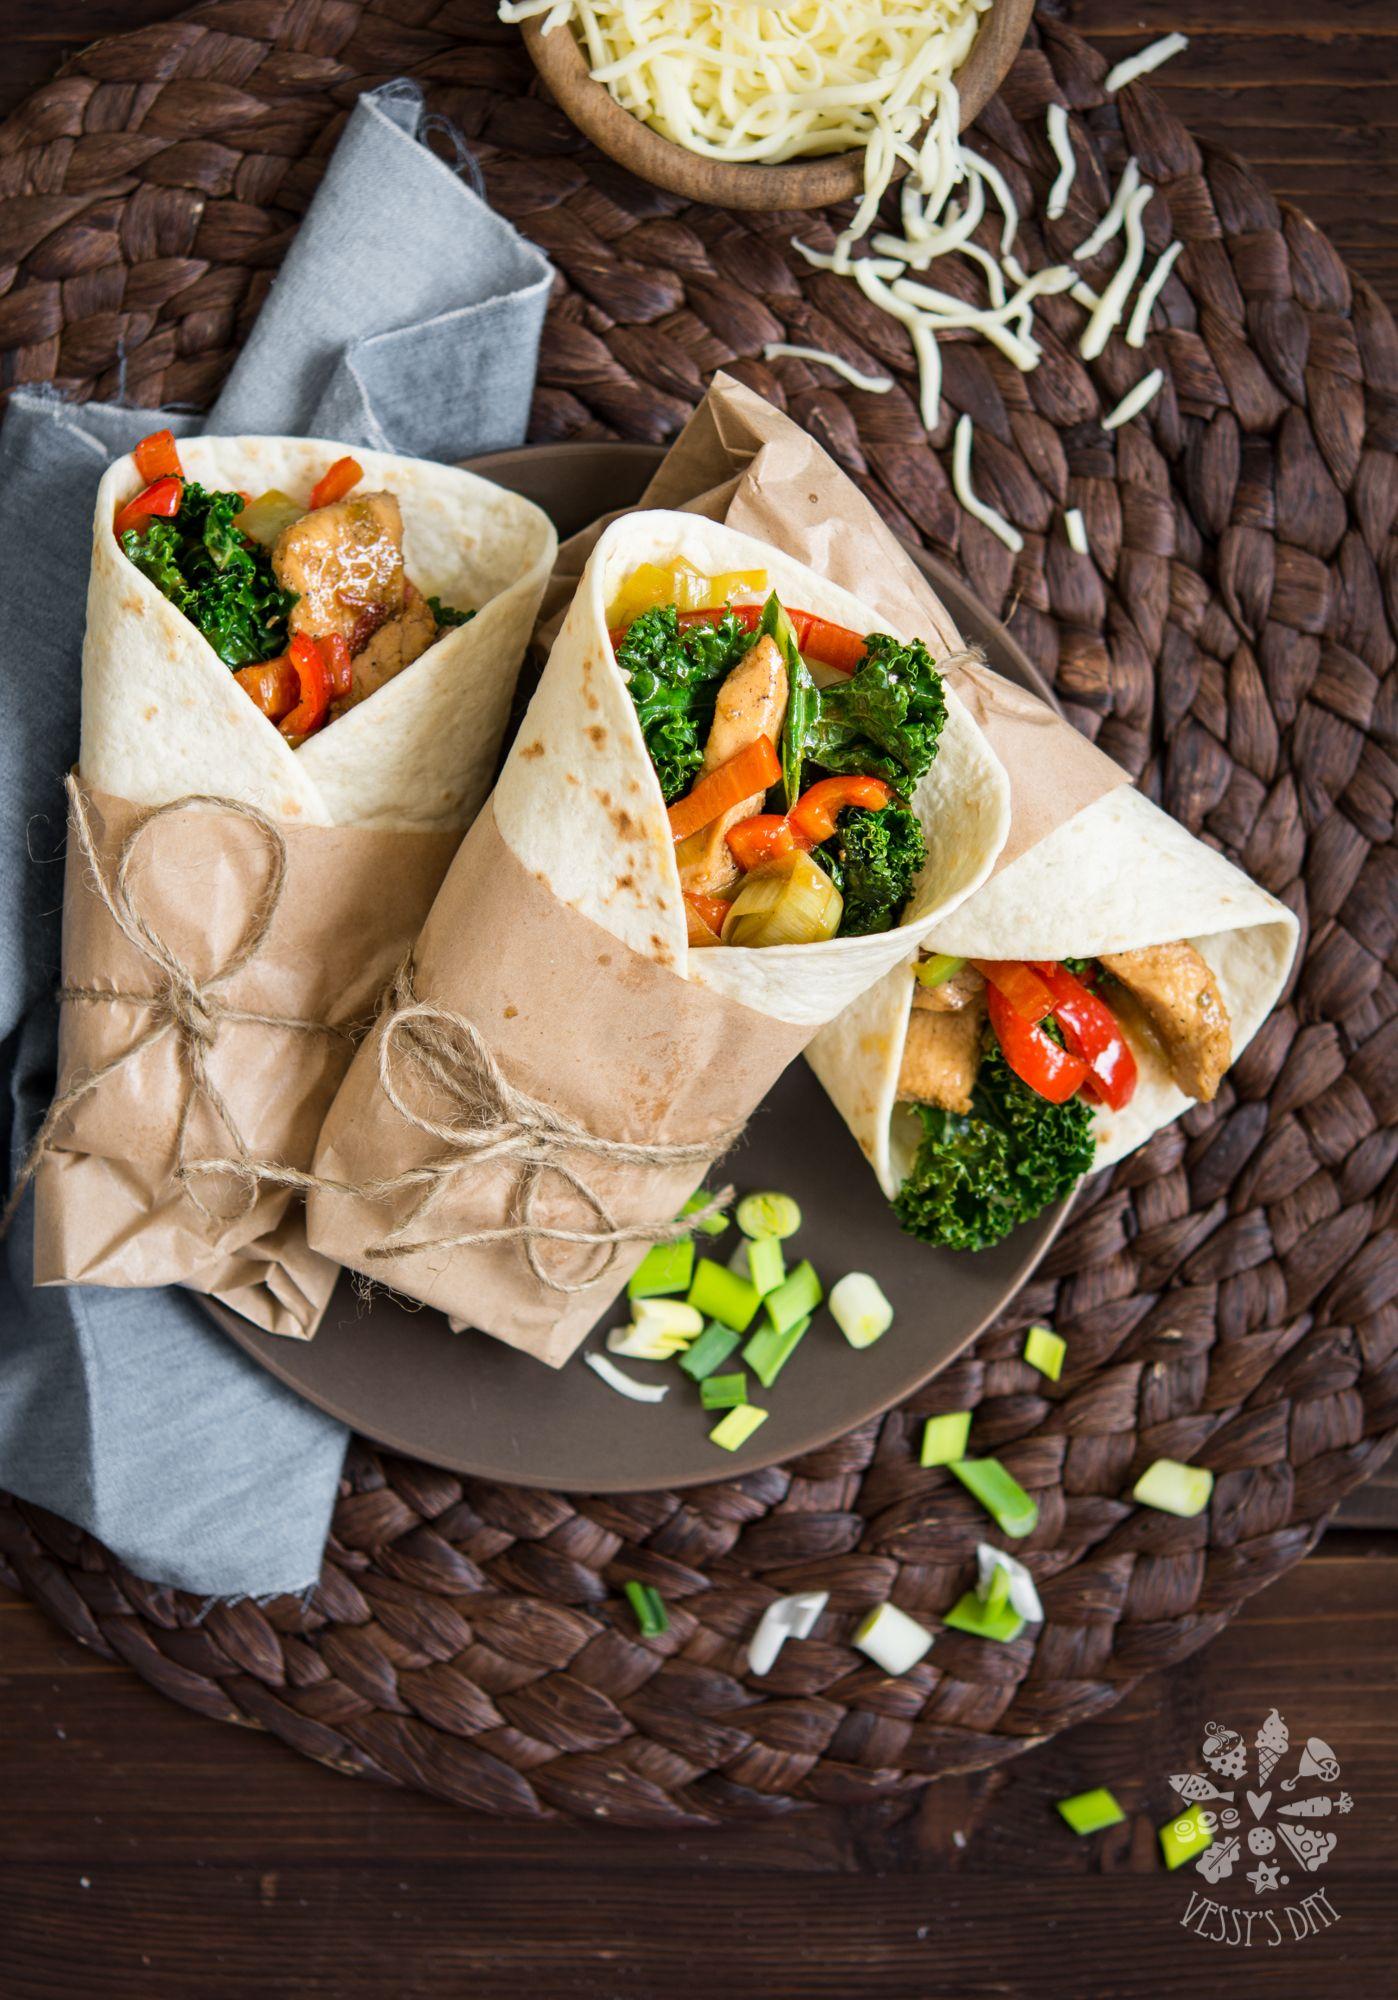 Chicken & kale tortillas